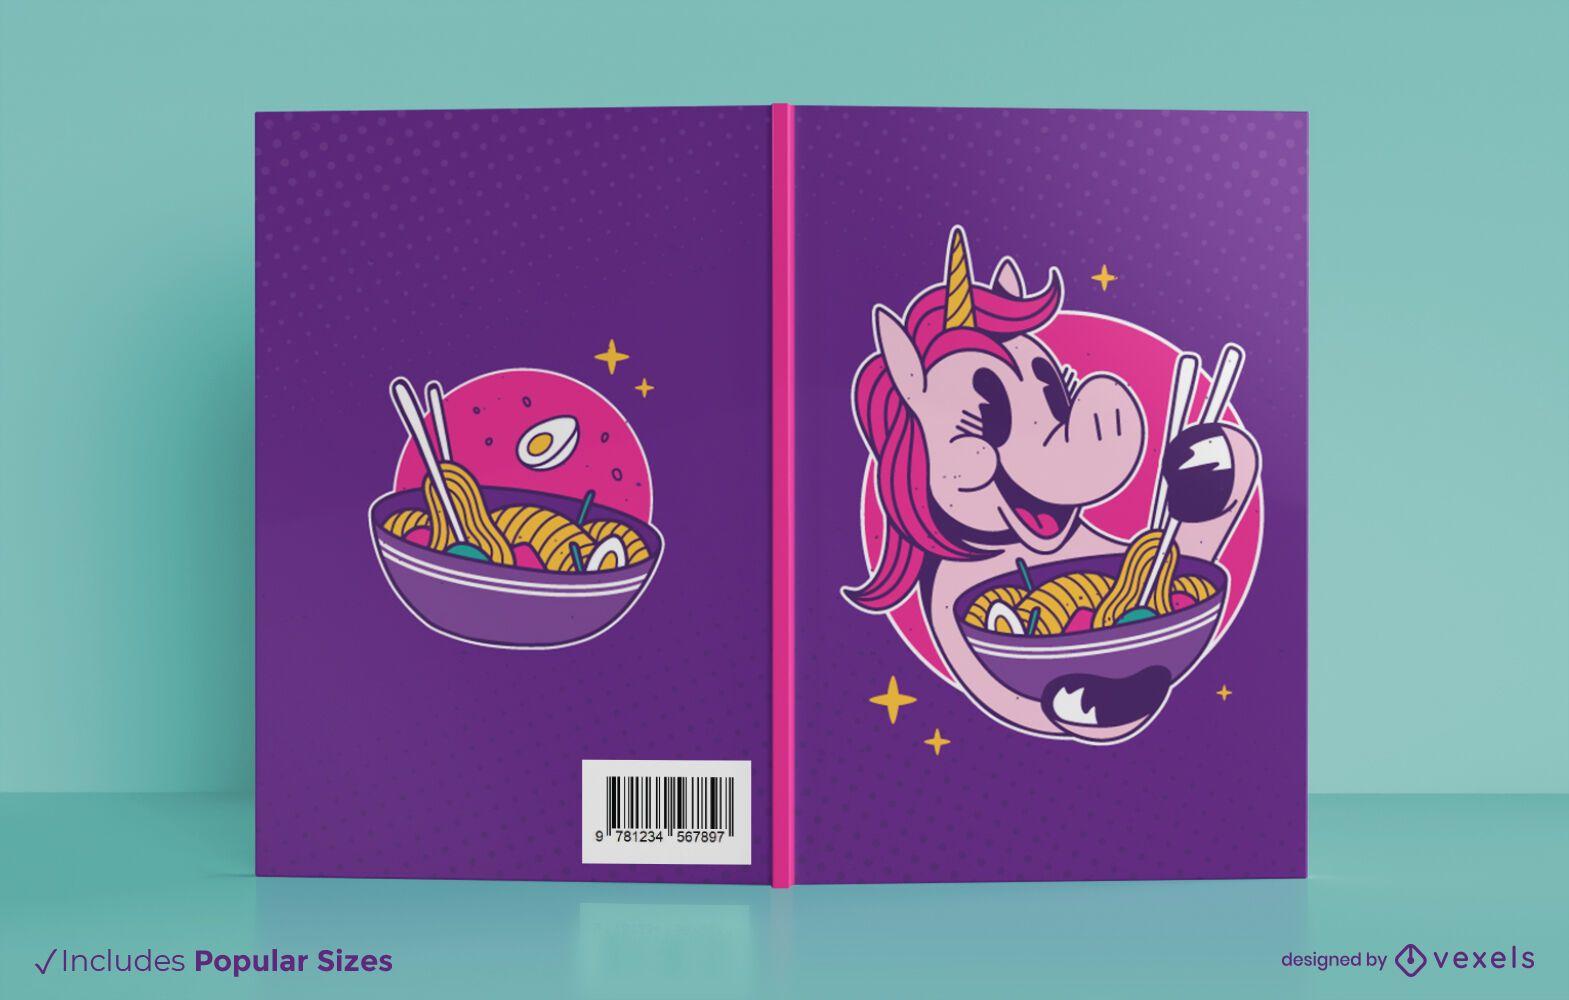 Ramen unicorn book cover design